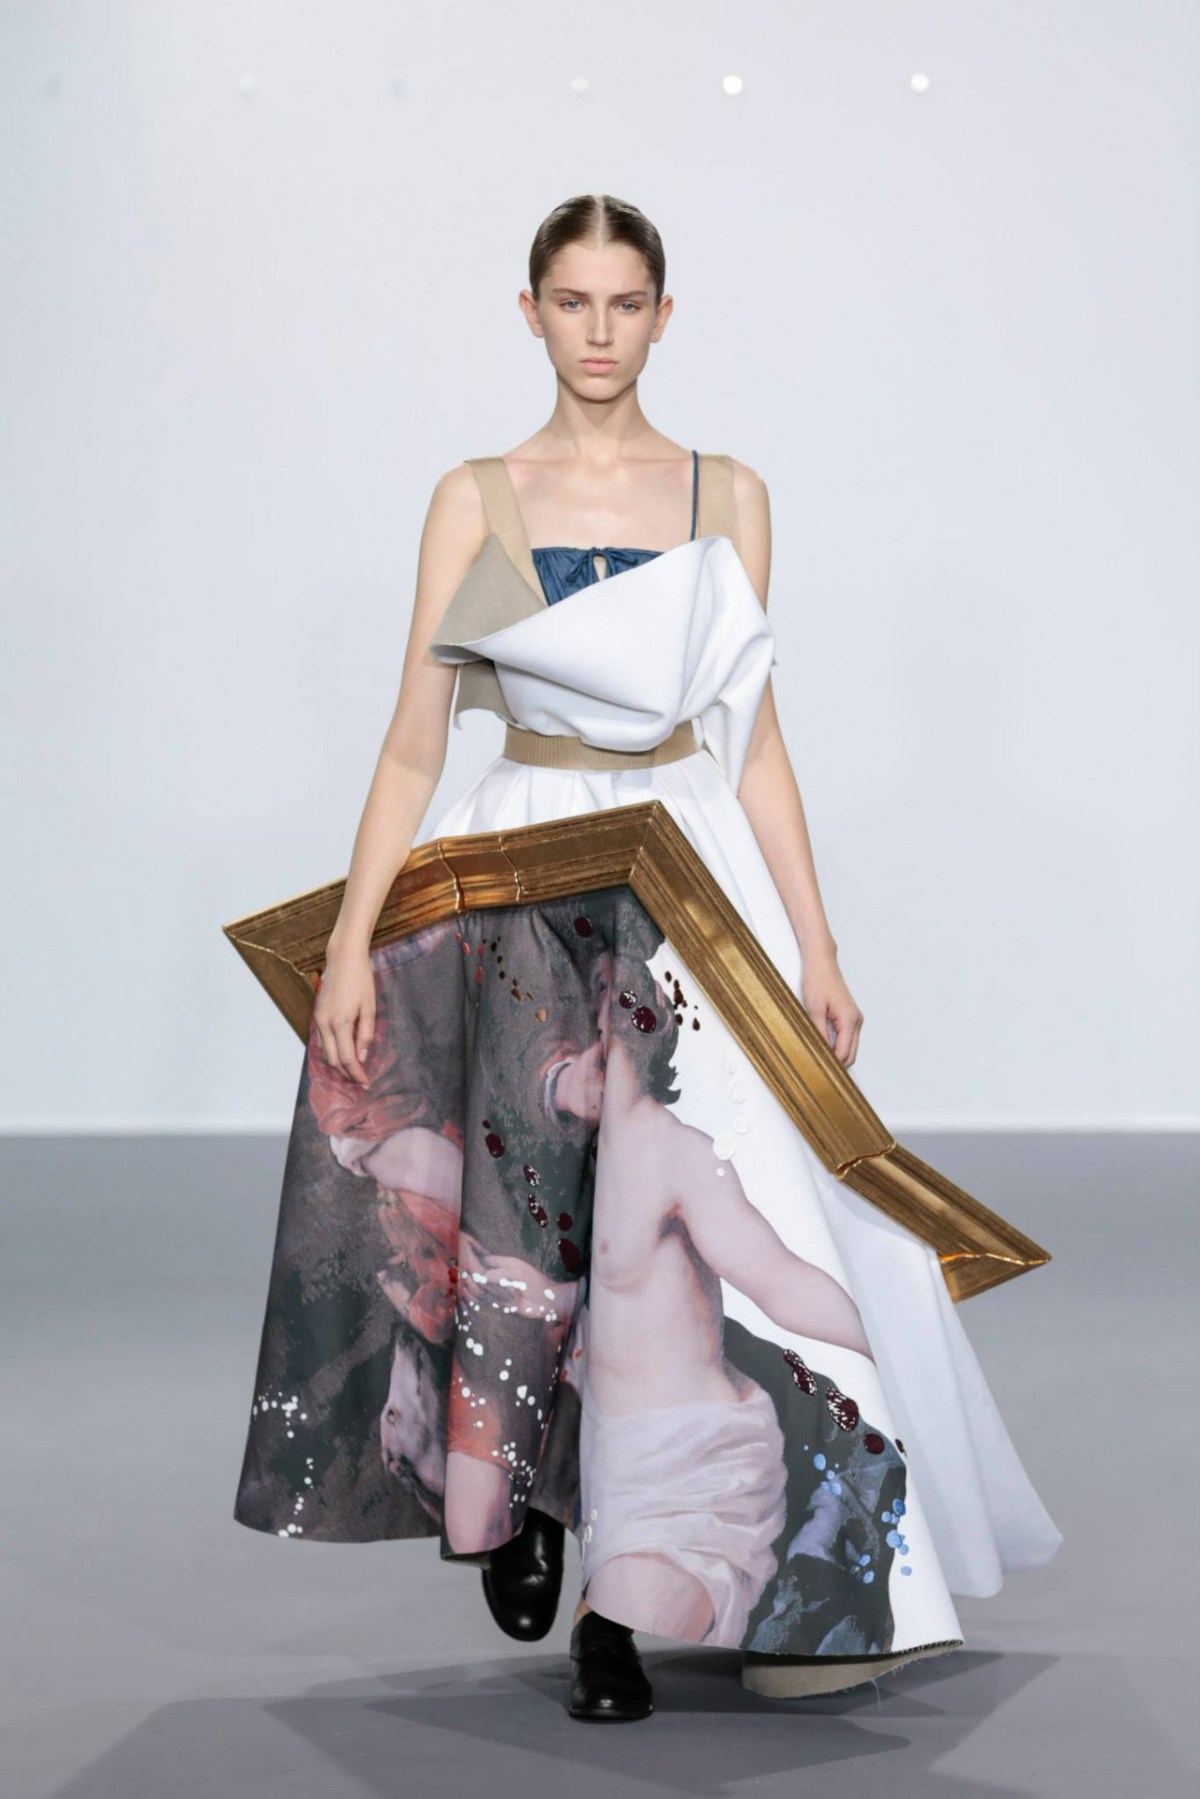 framed-painting-clothing-by-duthc-designer-viktor-and-rolf-05